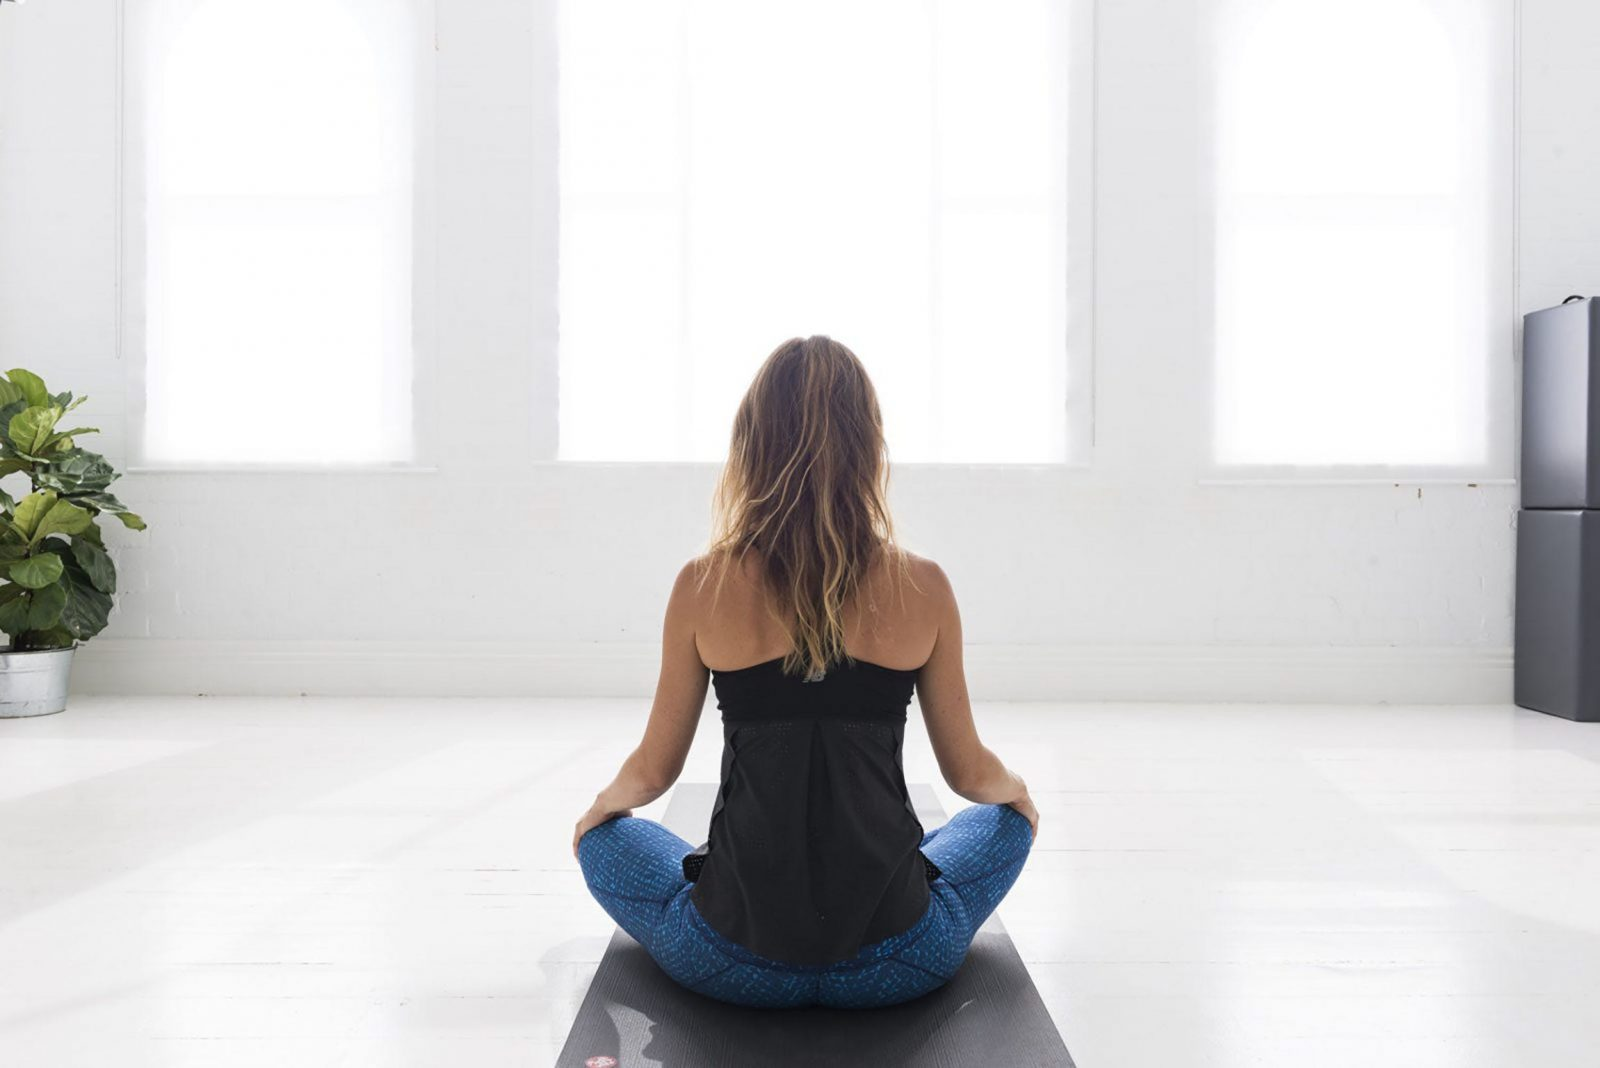 person sitting calmly in brightly lit yoga studio